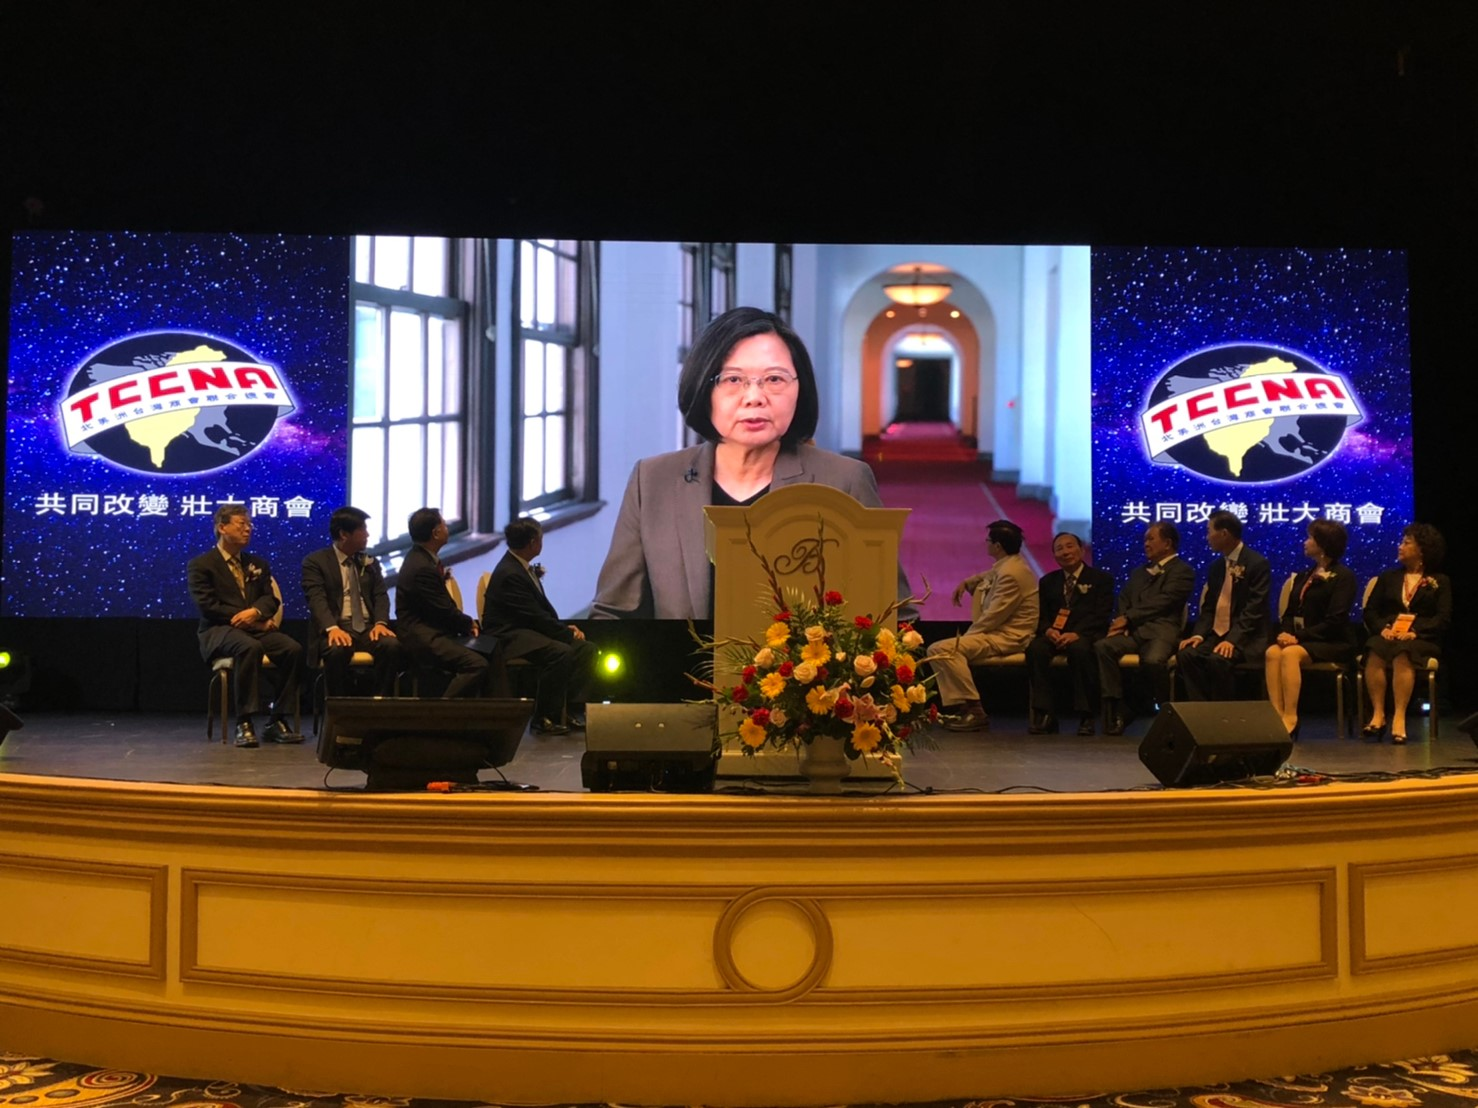 Taiwan President - President Tsa 蔡總統英文